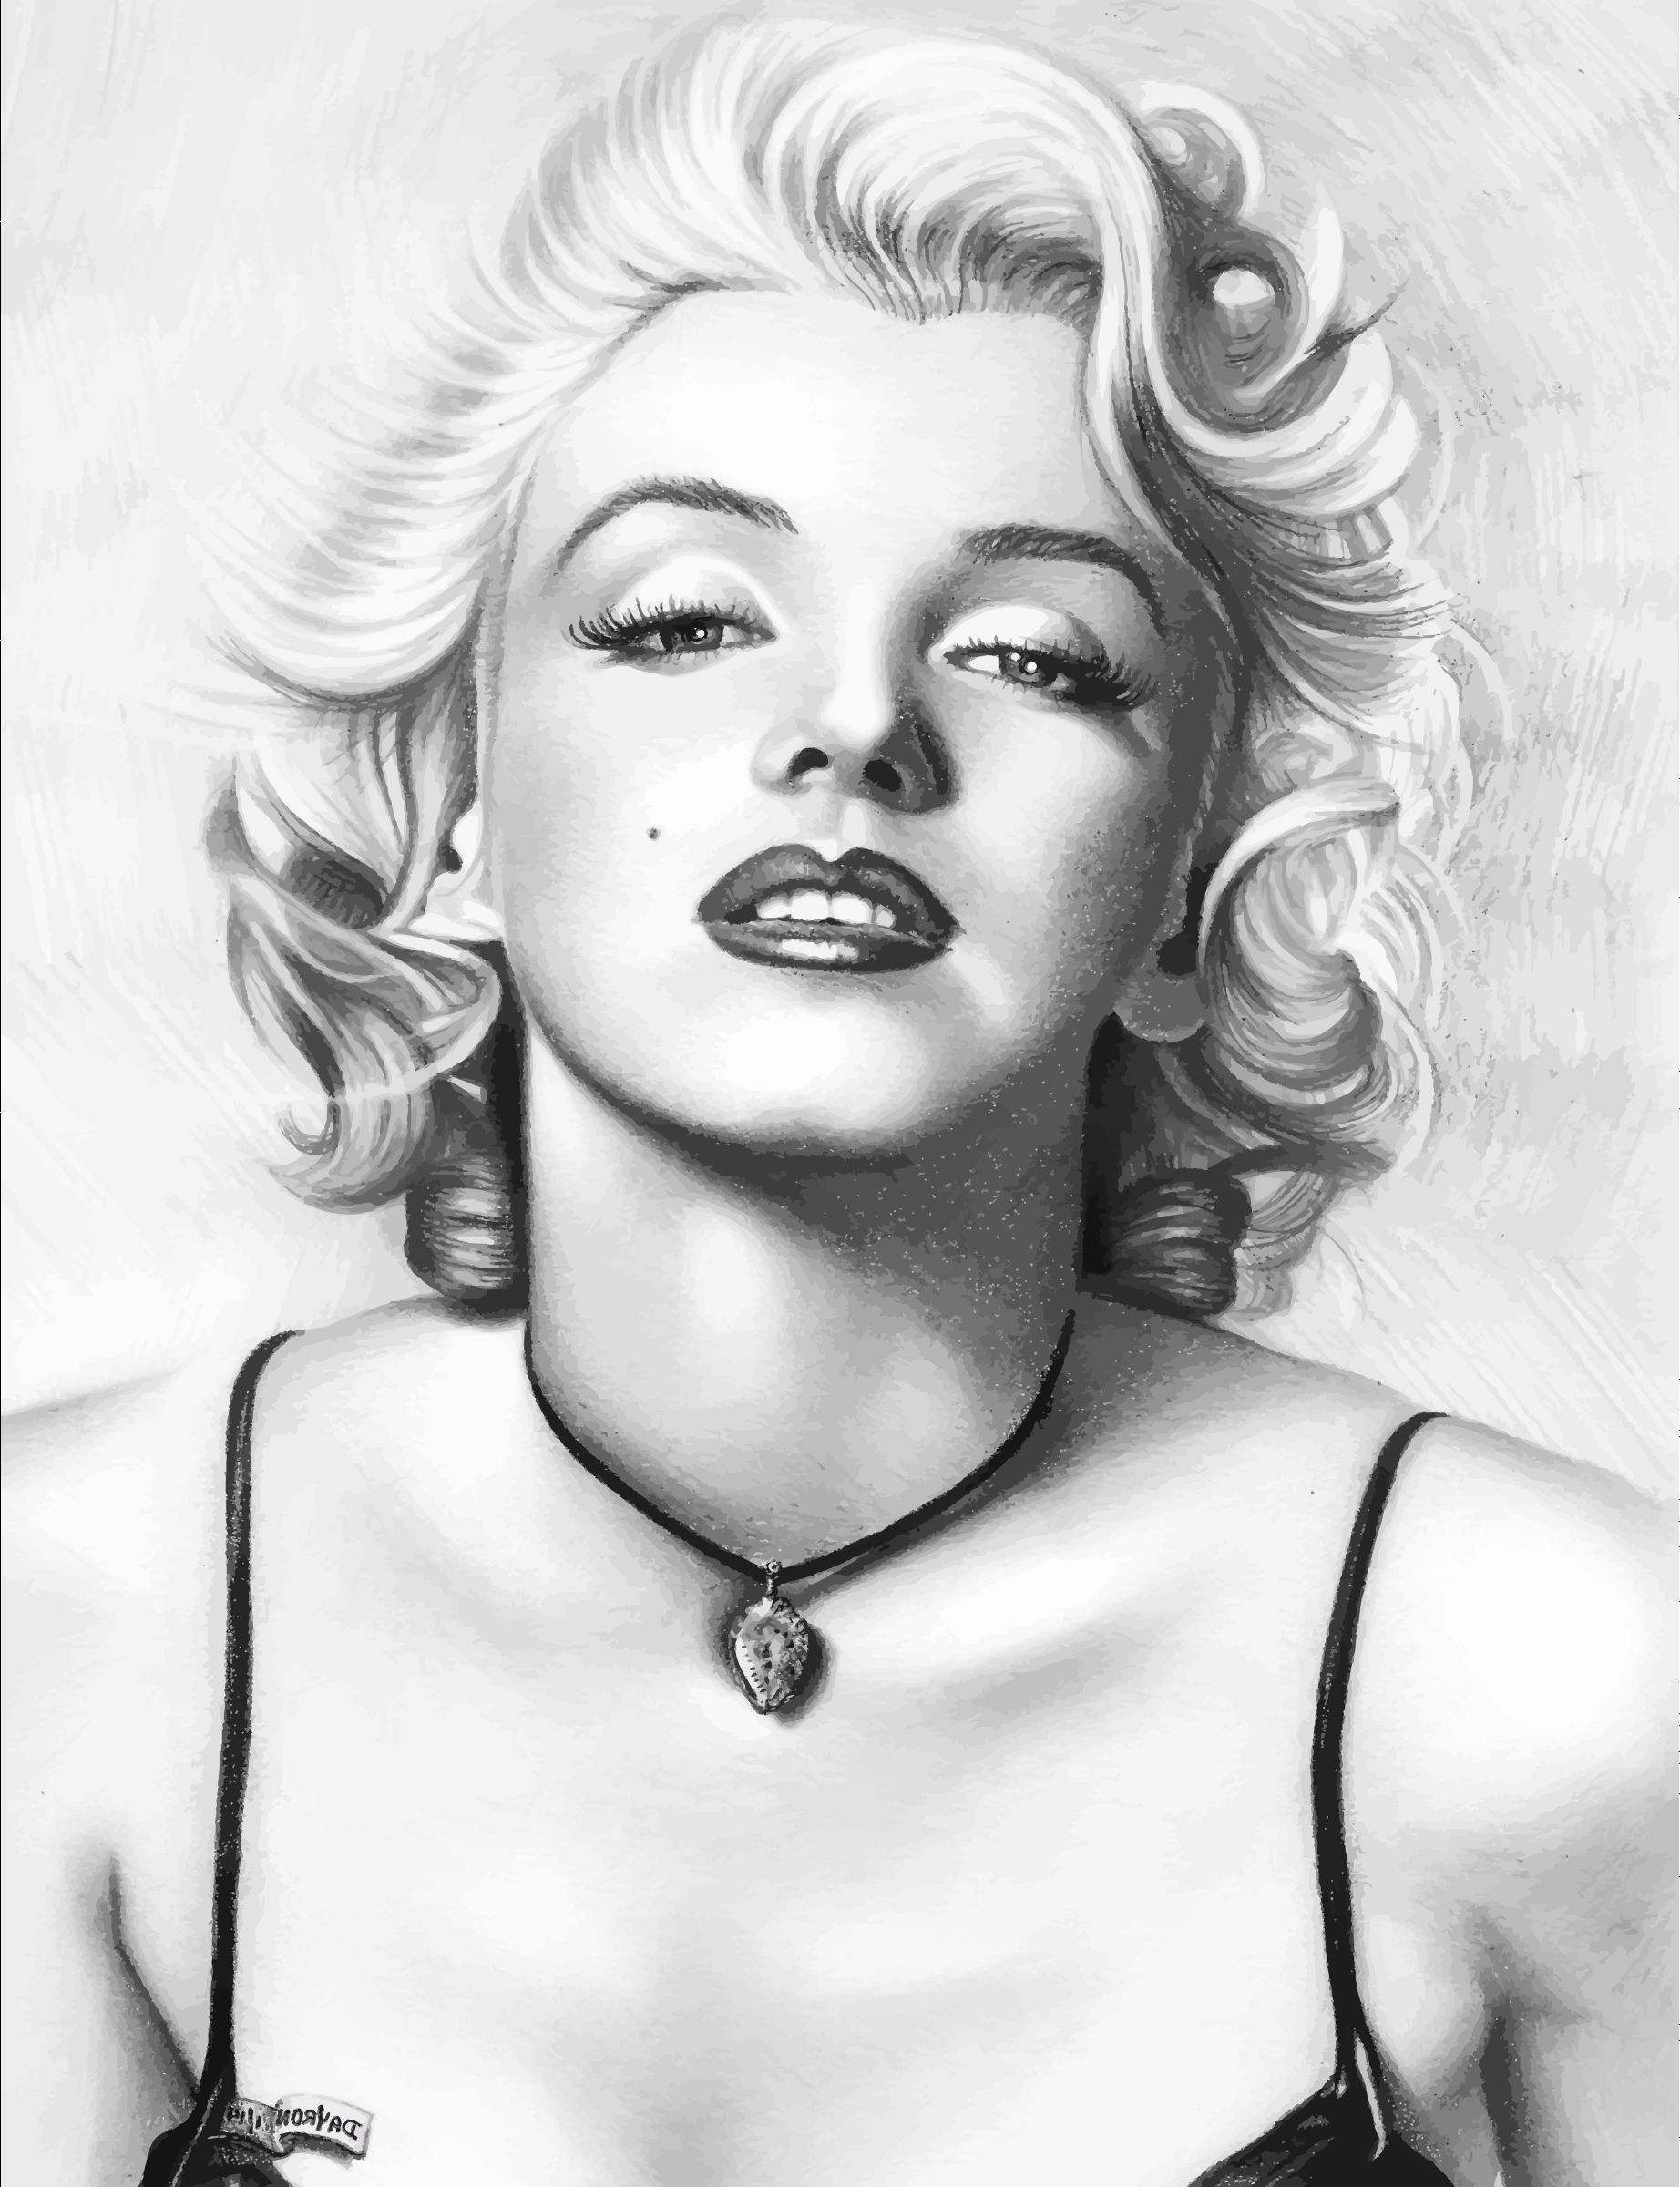 marilyn munroe vintage model  photo art print black white large